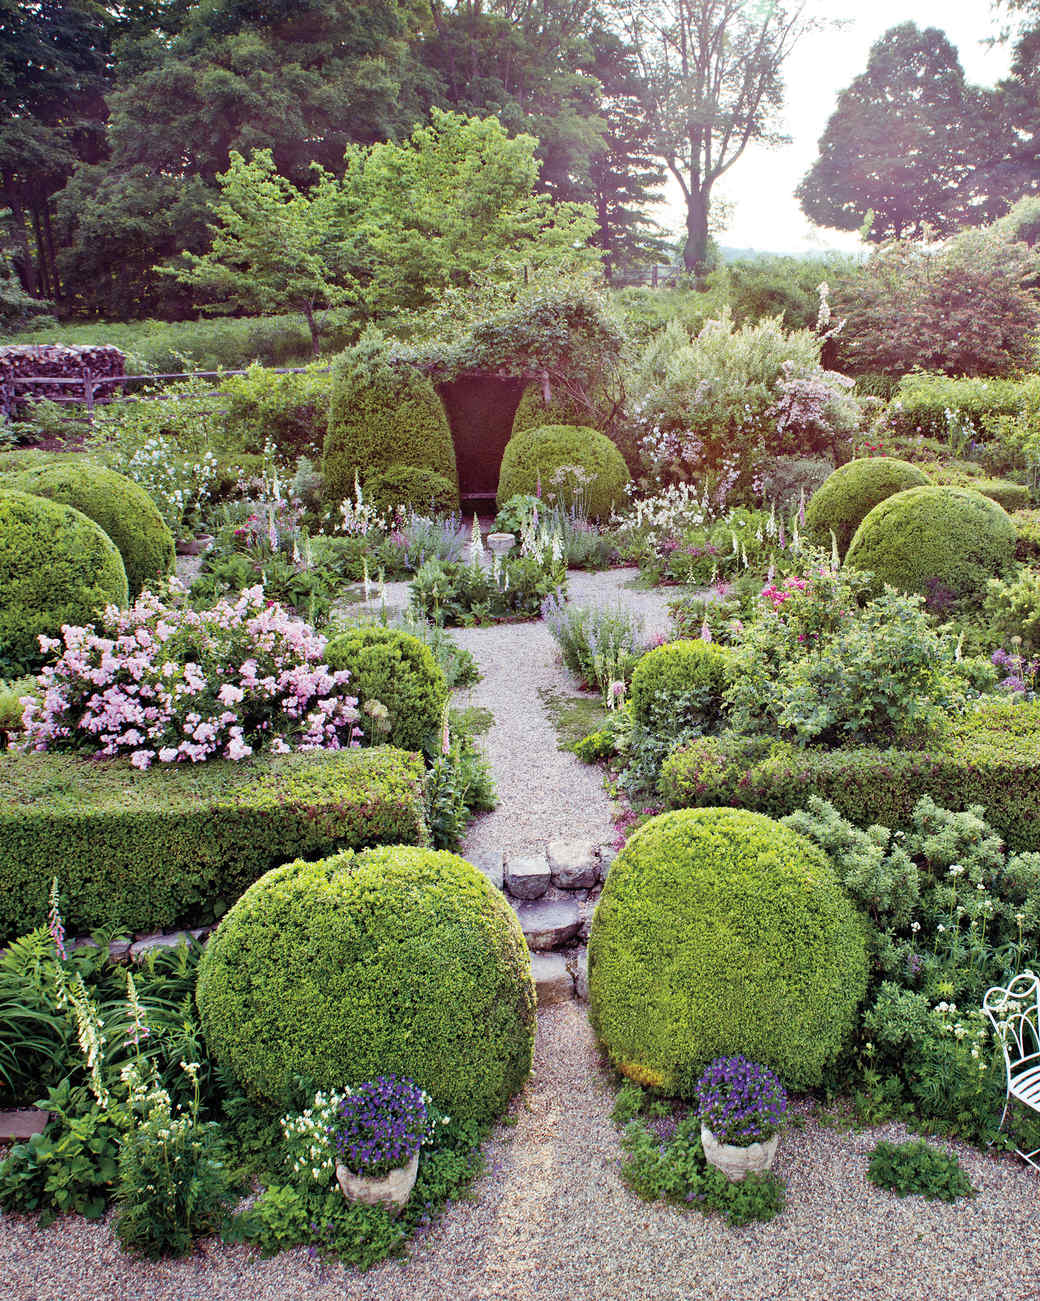 page-dickey-garden-md110307-95.jpg